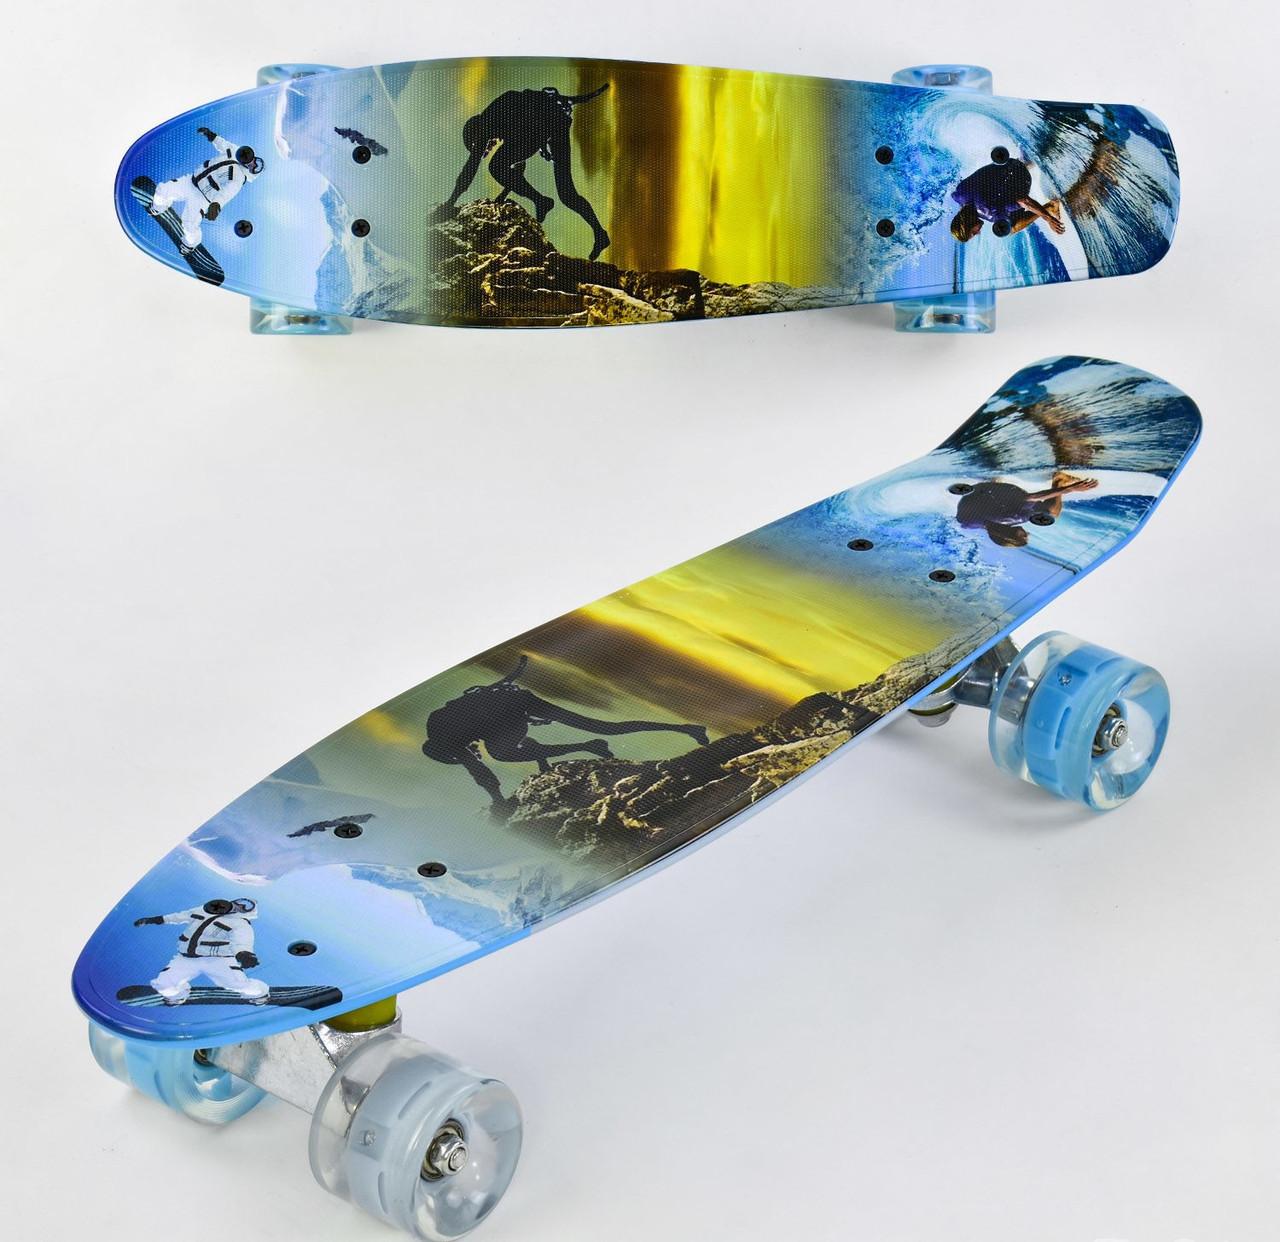 Пениборд F 3270 Best Board, доска=55 см, колёса PU, светятся